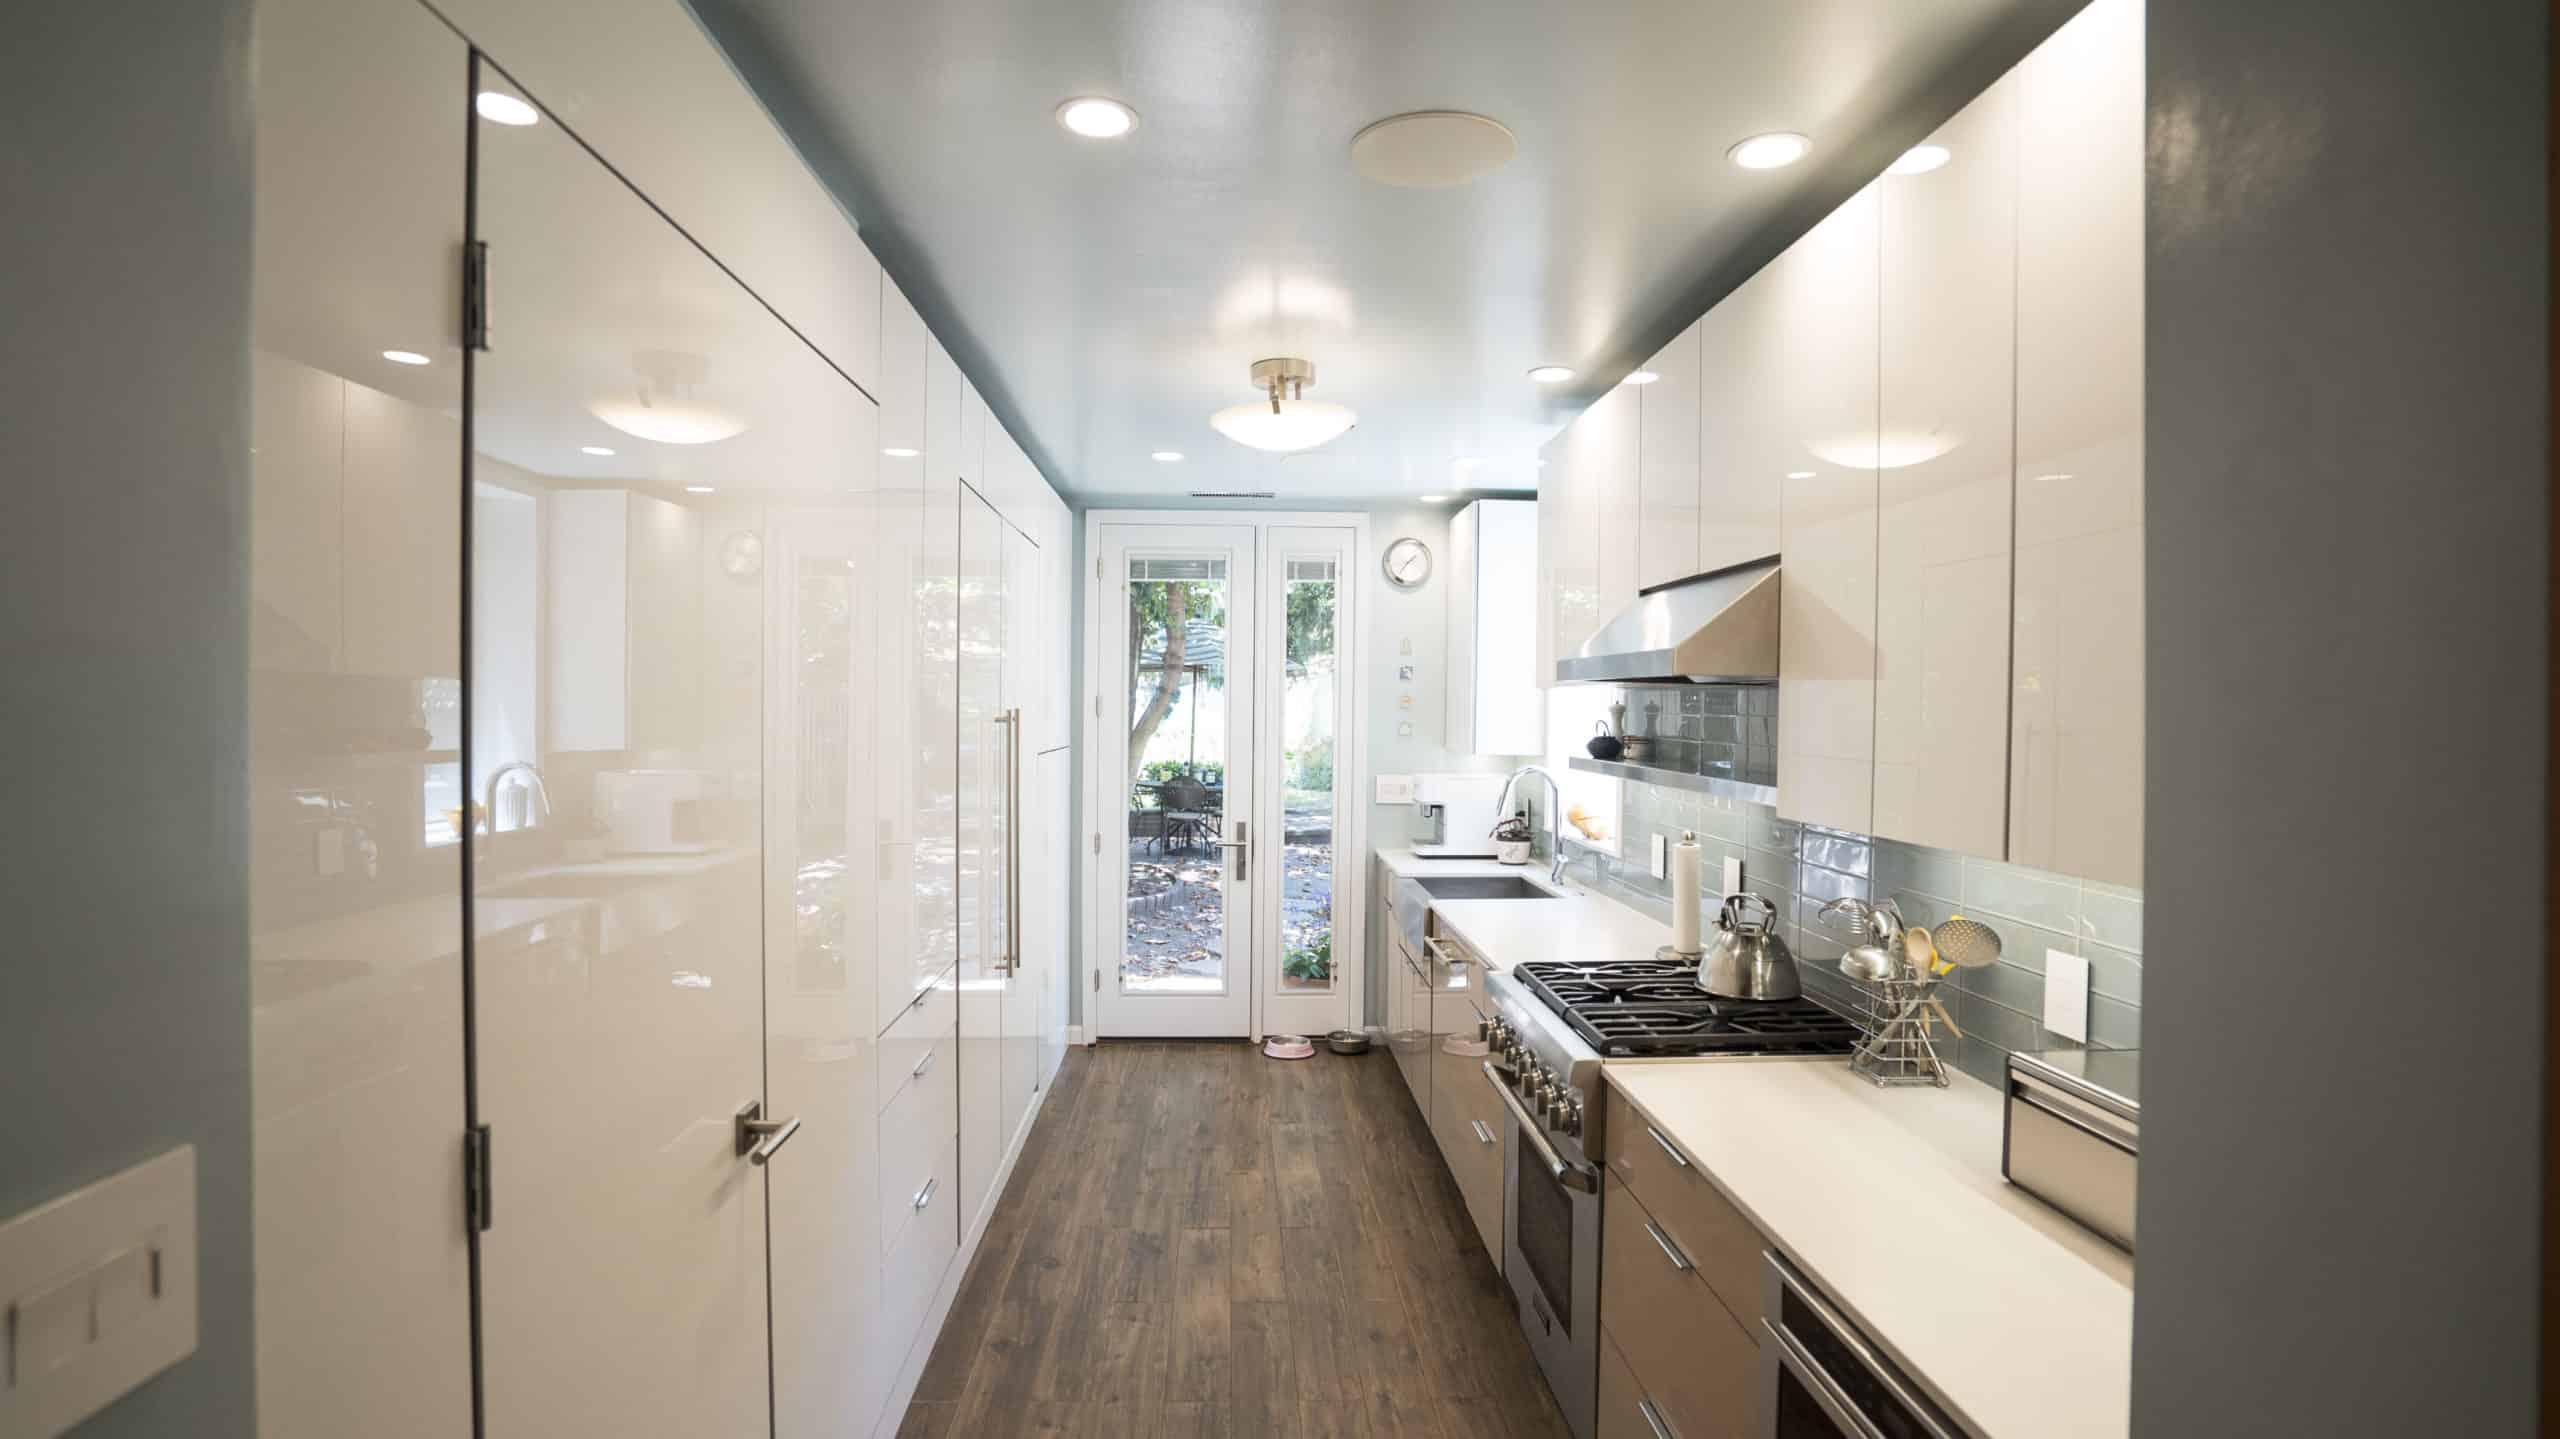 Kitchen Remodeling in Washington, DC - Kitchen & Bath Remodeling ...